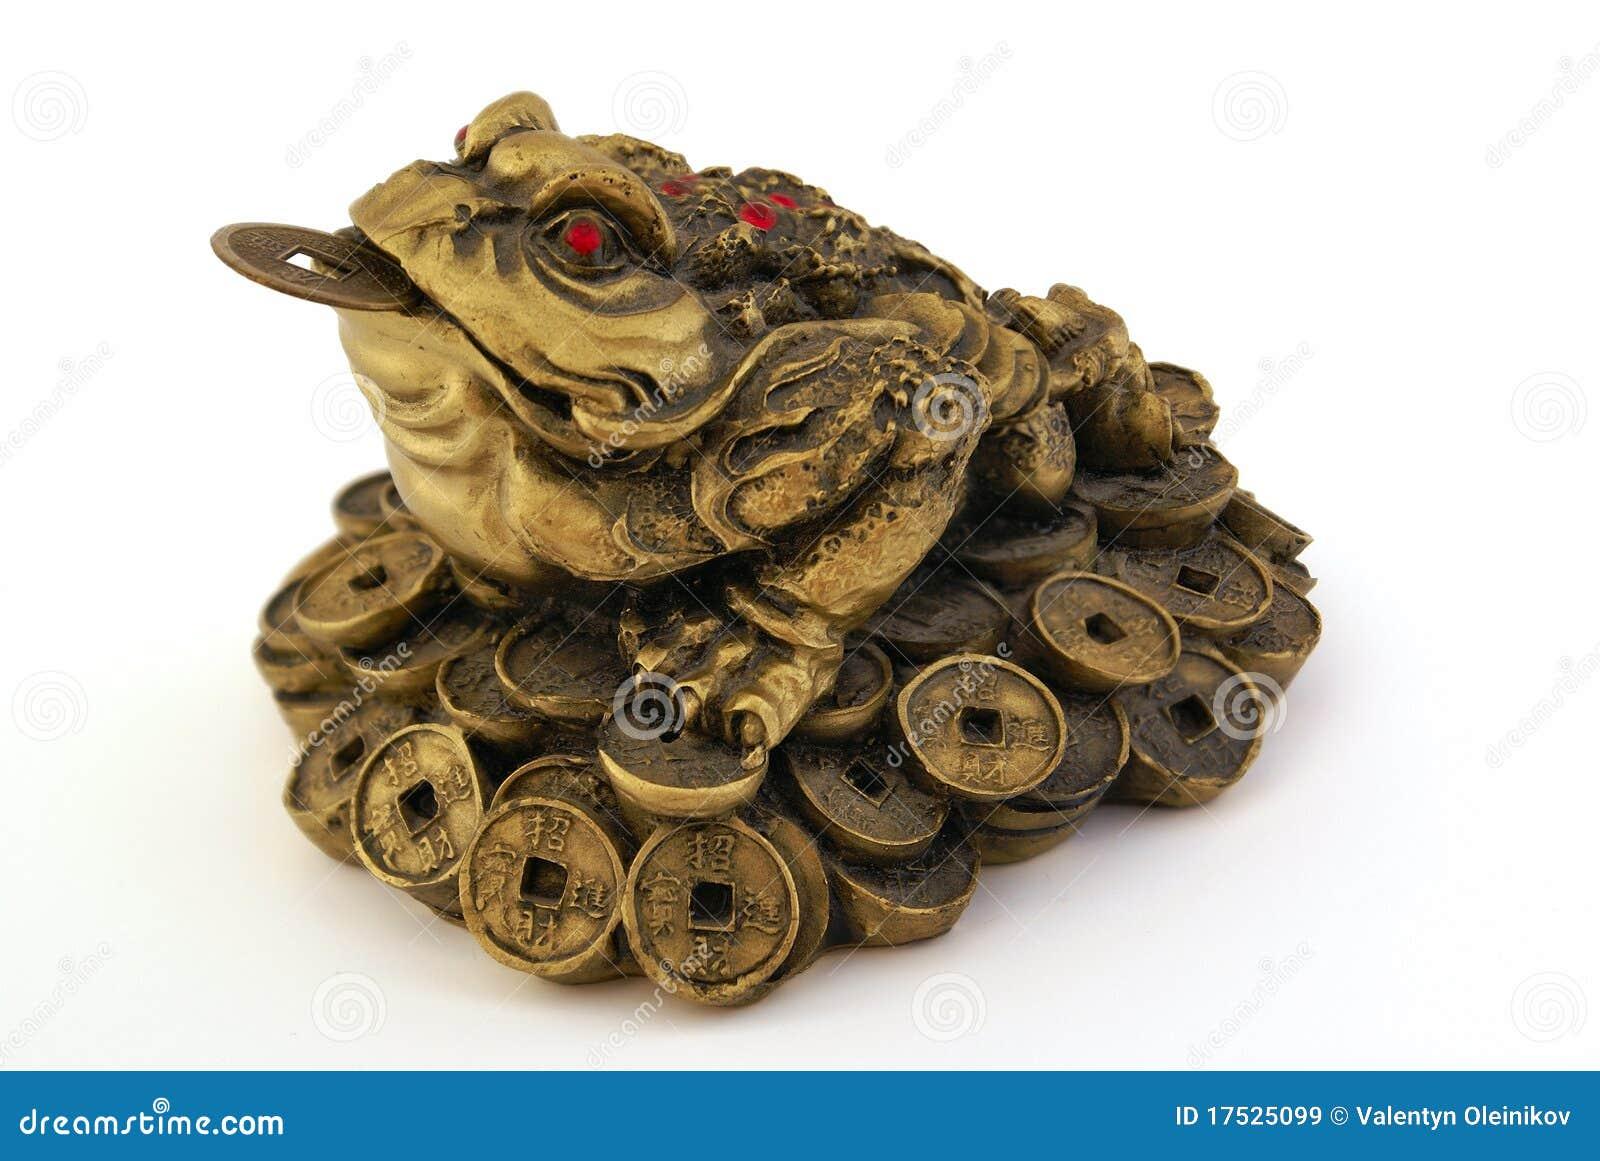 feng shui money toad royalty free stock images image 17525099. Black Bedroom Furniture Sets. Home Design Ideas